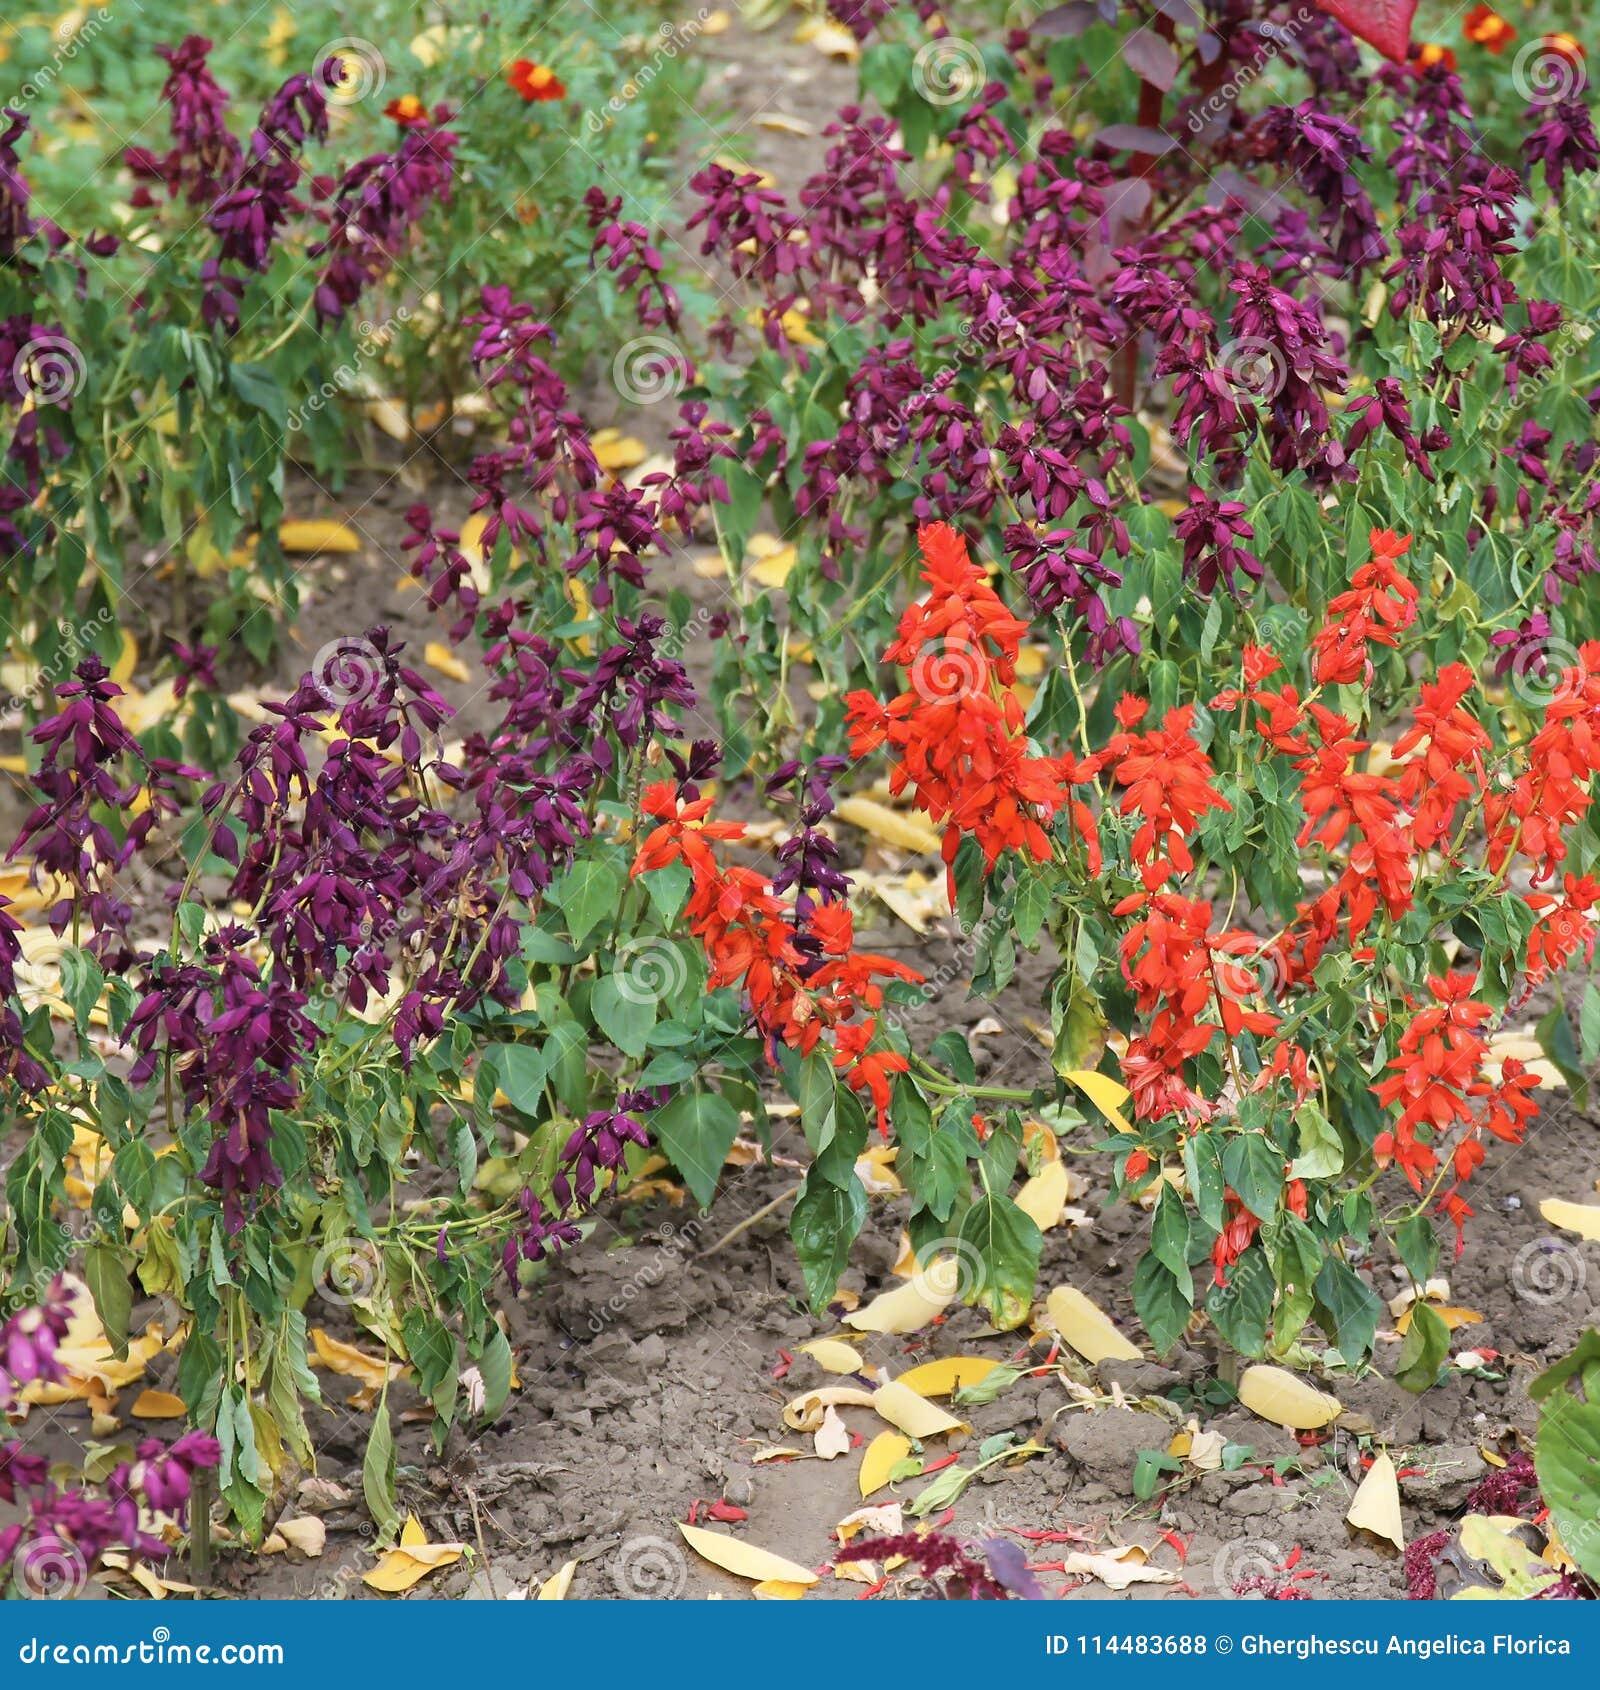 Lobelia Cardinalis Queen Victoria Flower Stock Photo Image Of